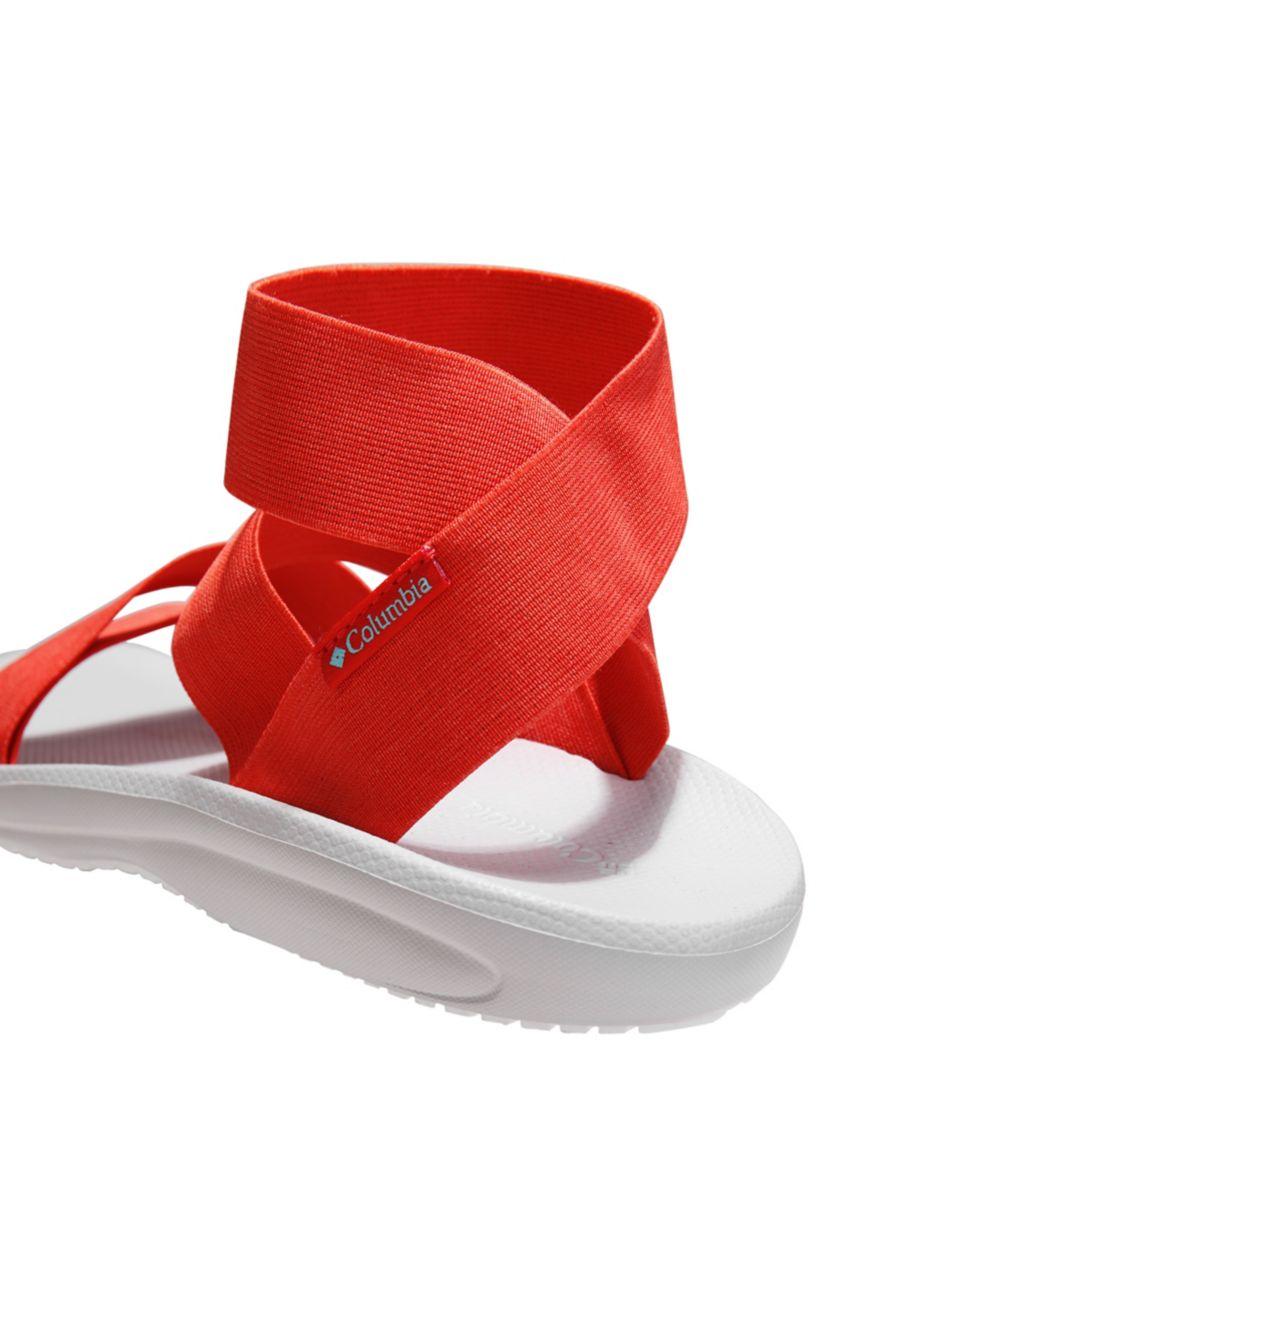 Barraca Sandalia Sportswear Para Mujercolumbia W29edih Strap EHYD2eW9I